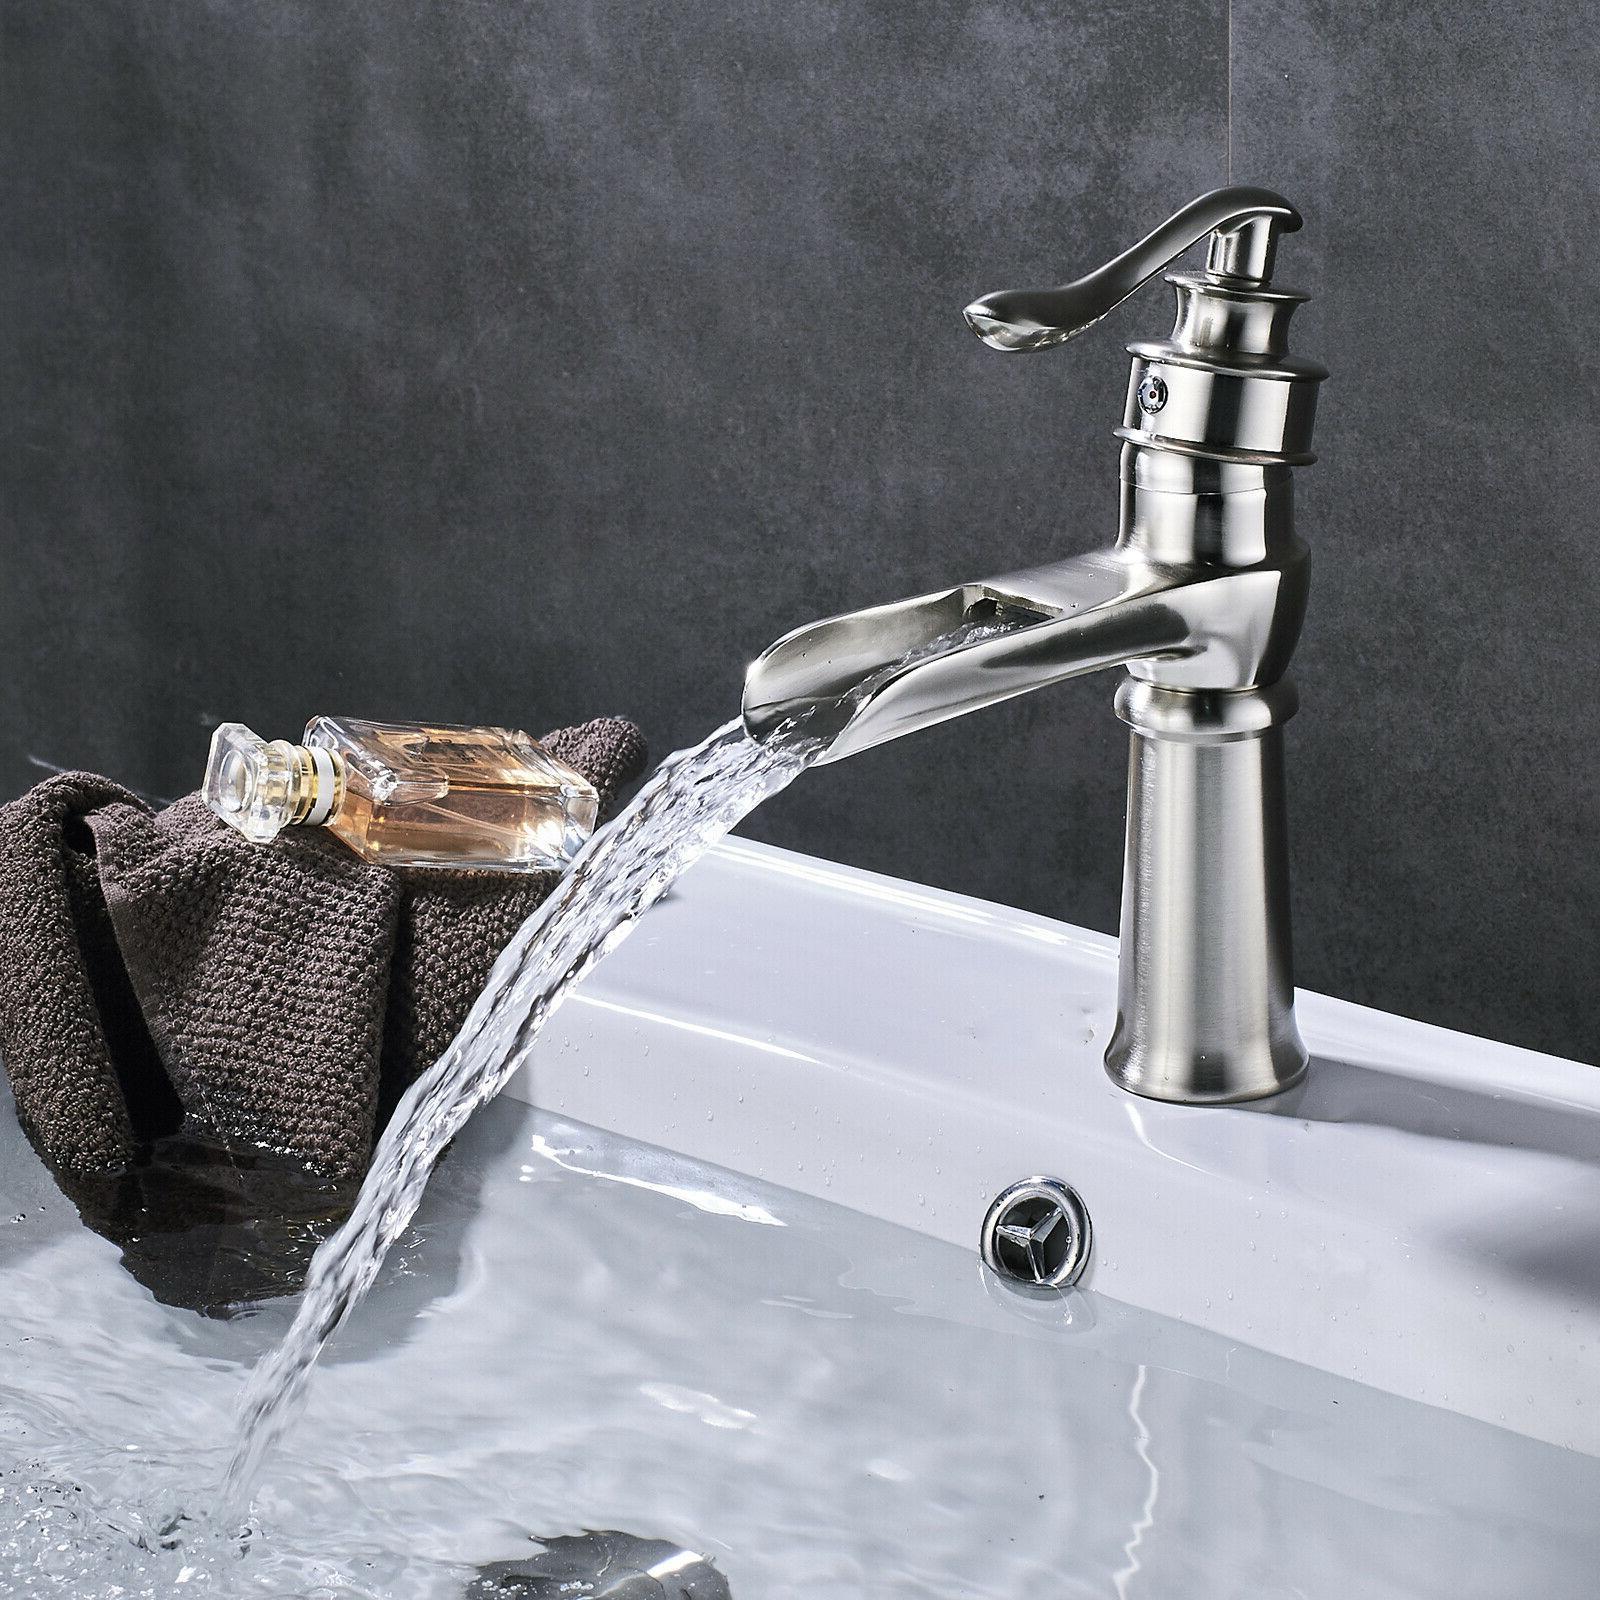 BWE Waterfall Spout Nickel 3 Faucet